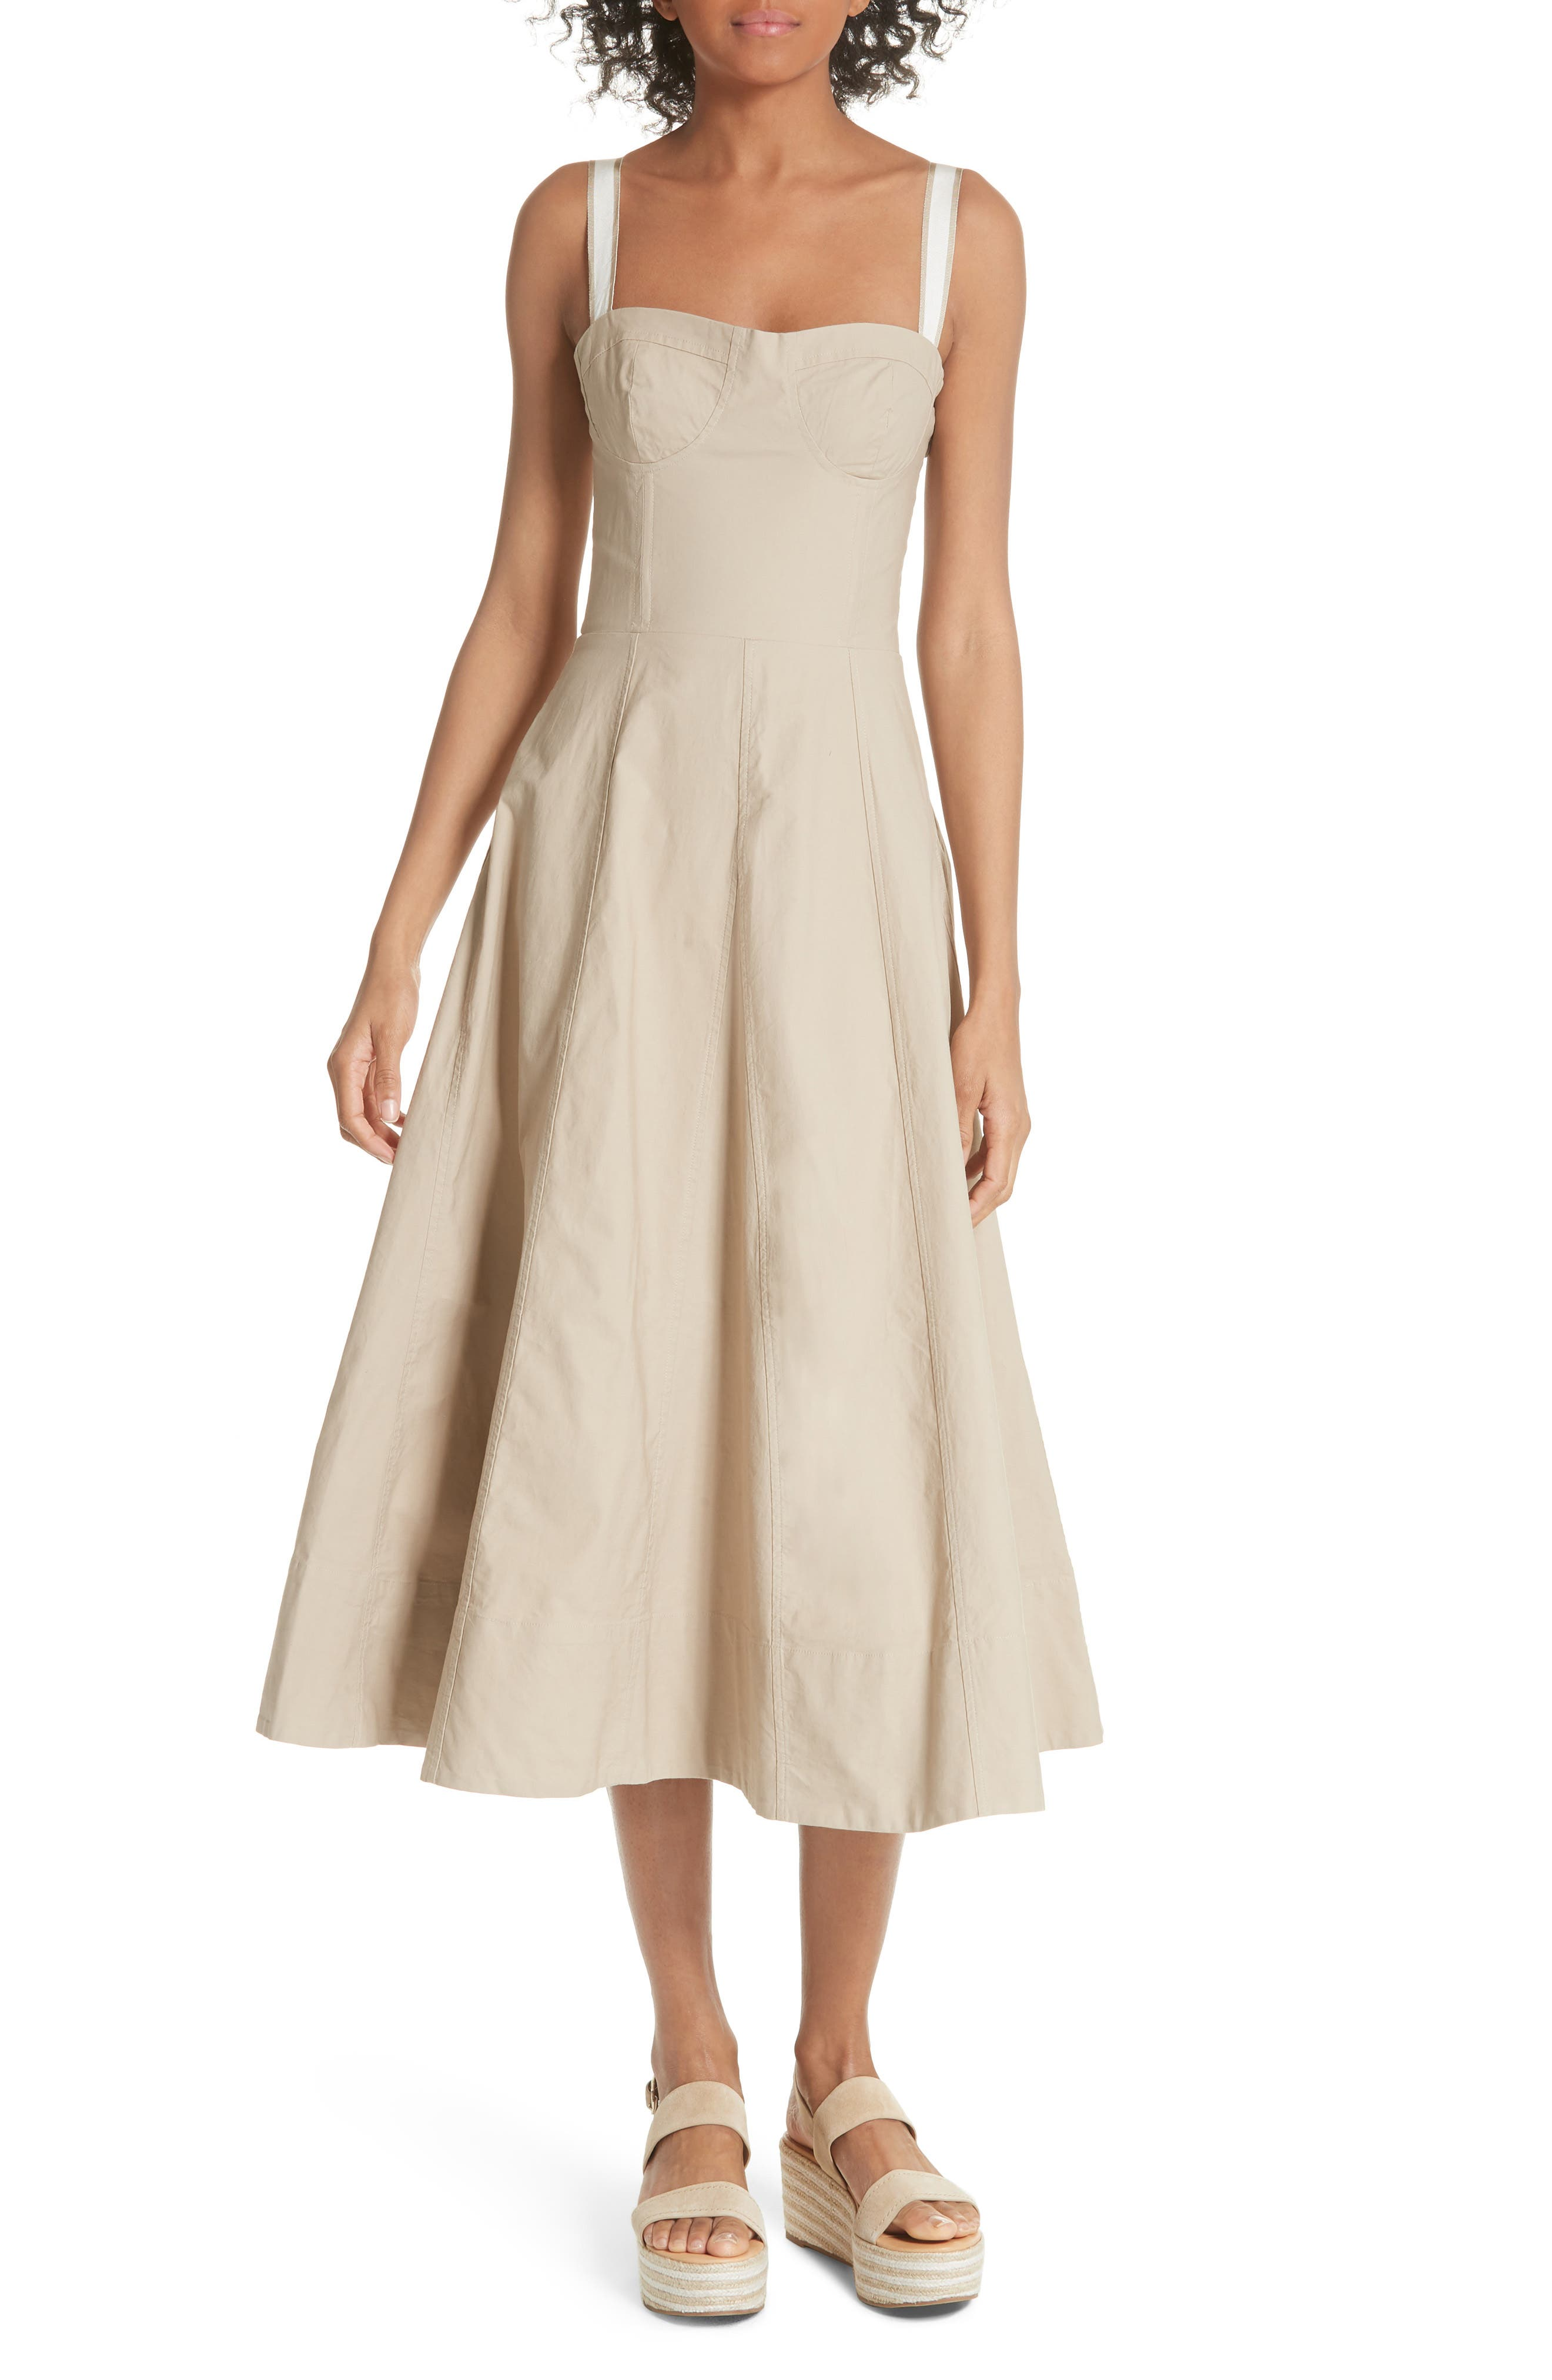 Briel Midi Dress,                             Main thumbnail 1, color,                             253